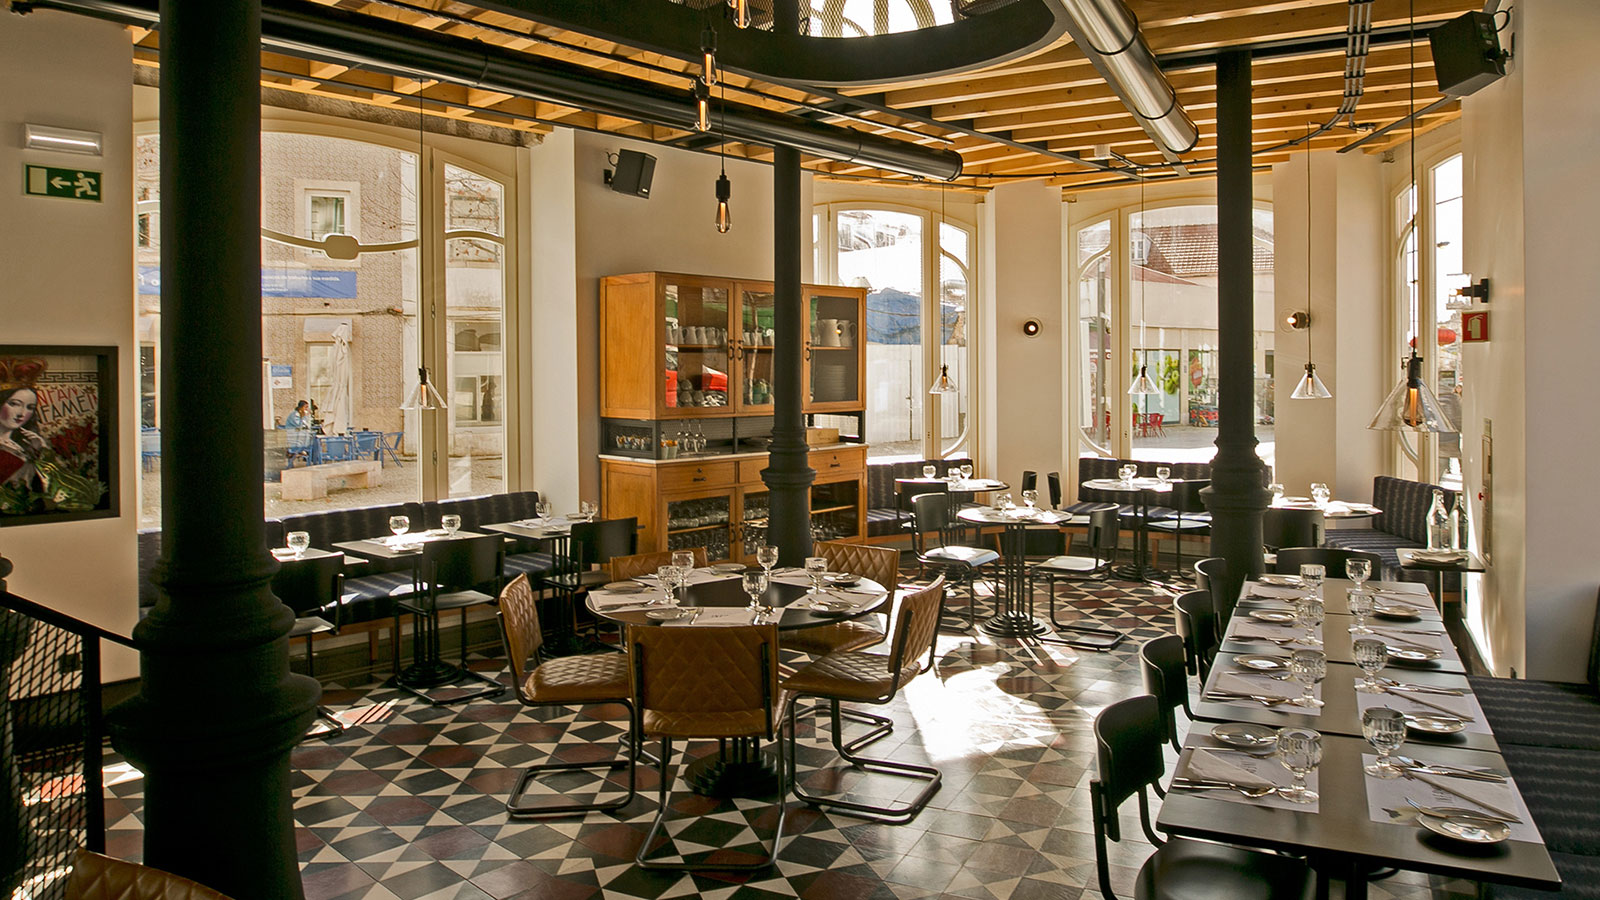 Infame restaurant in Lisbon